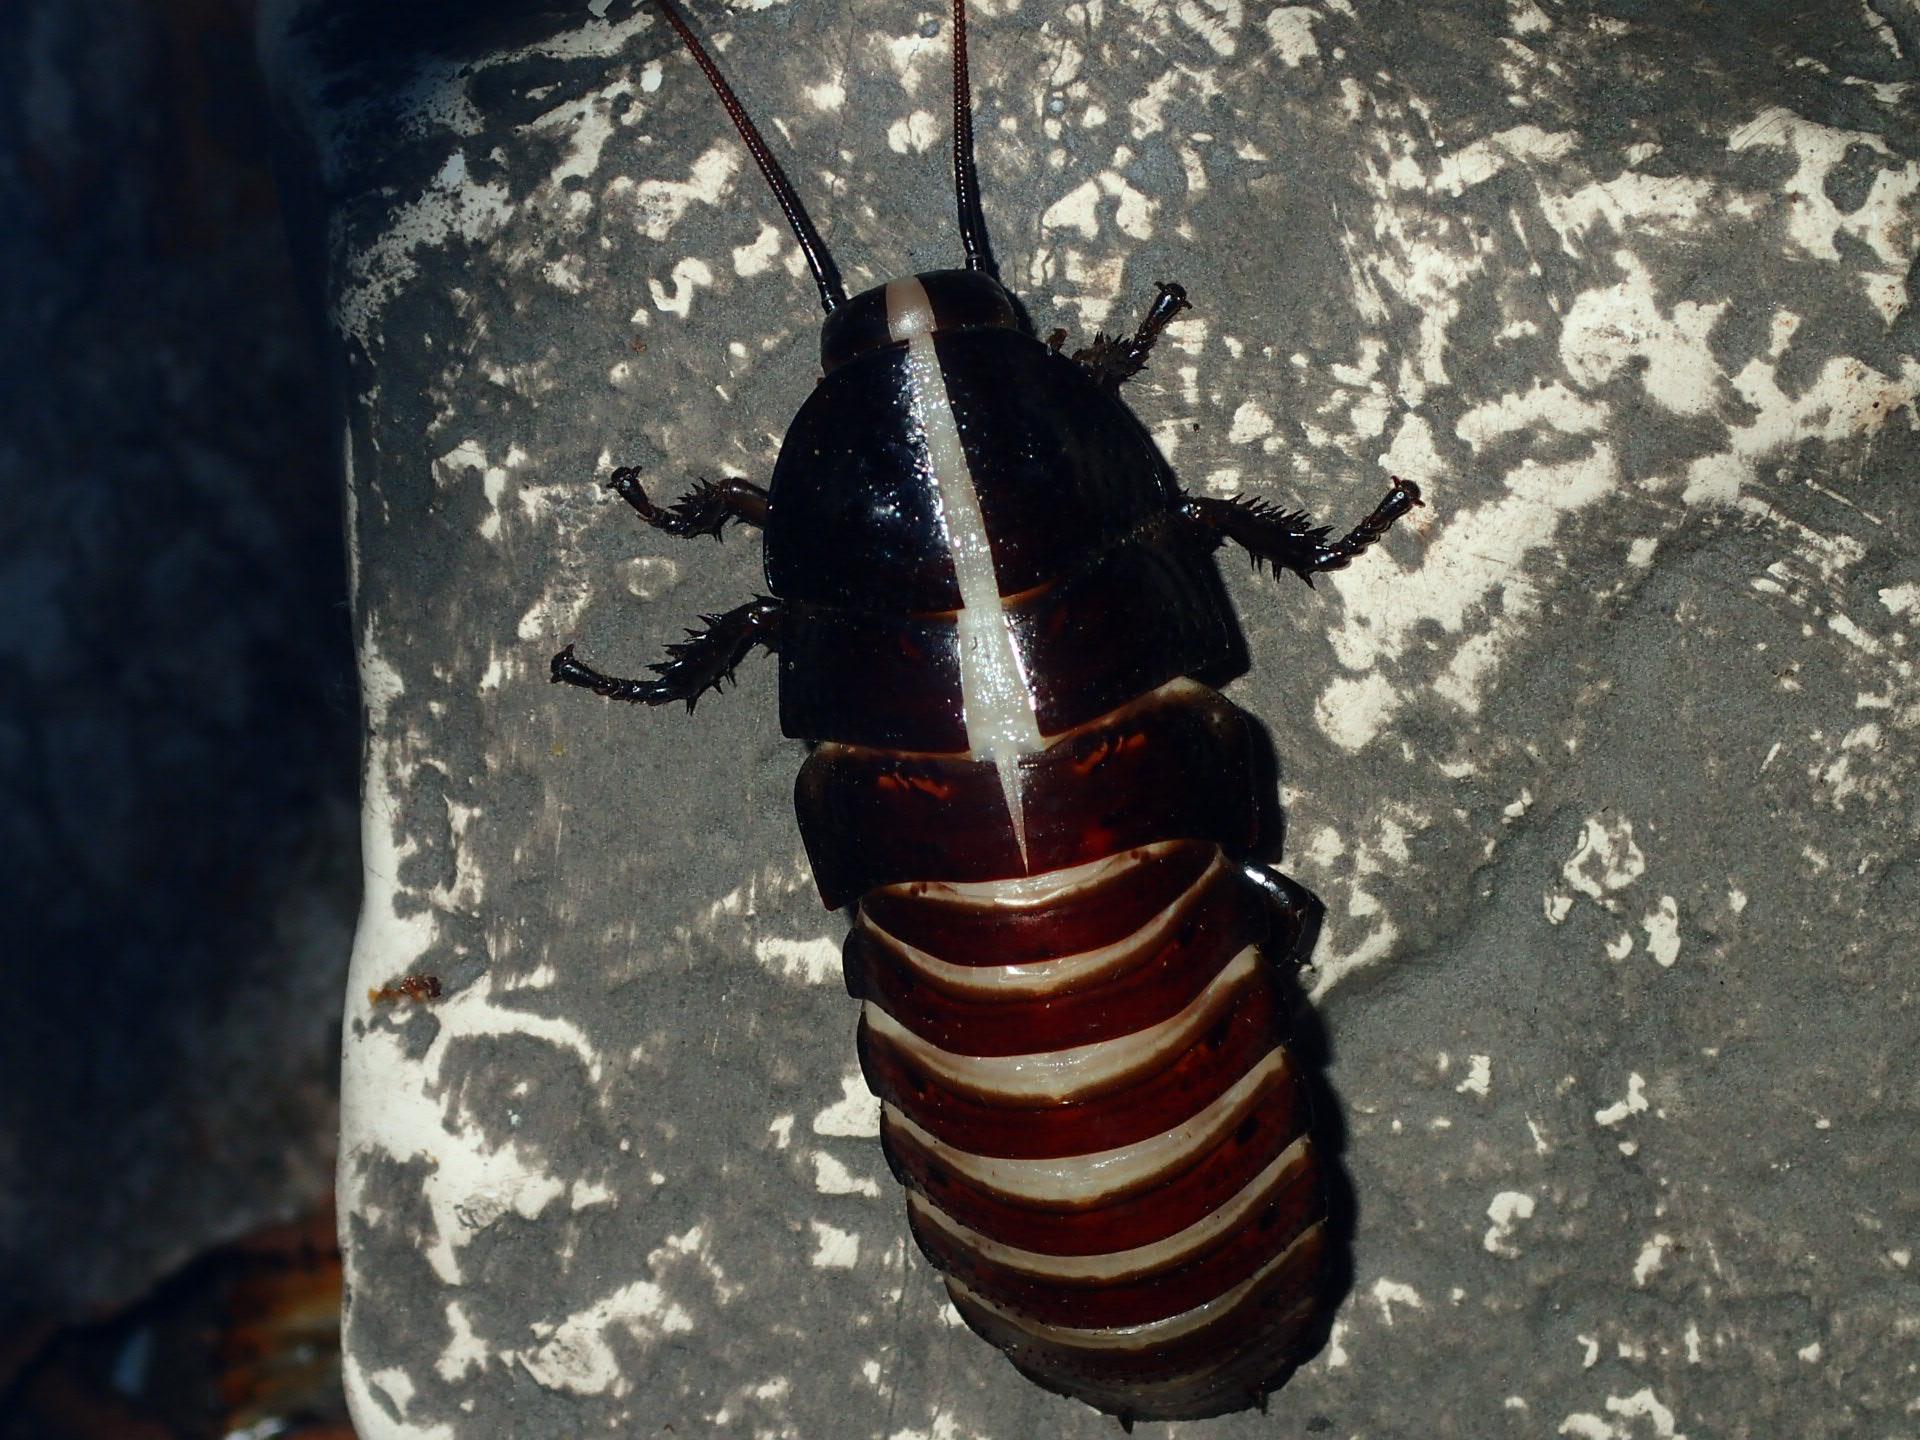 Hissing Roach - Split widens